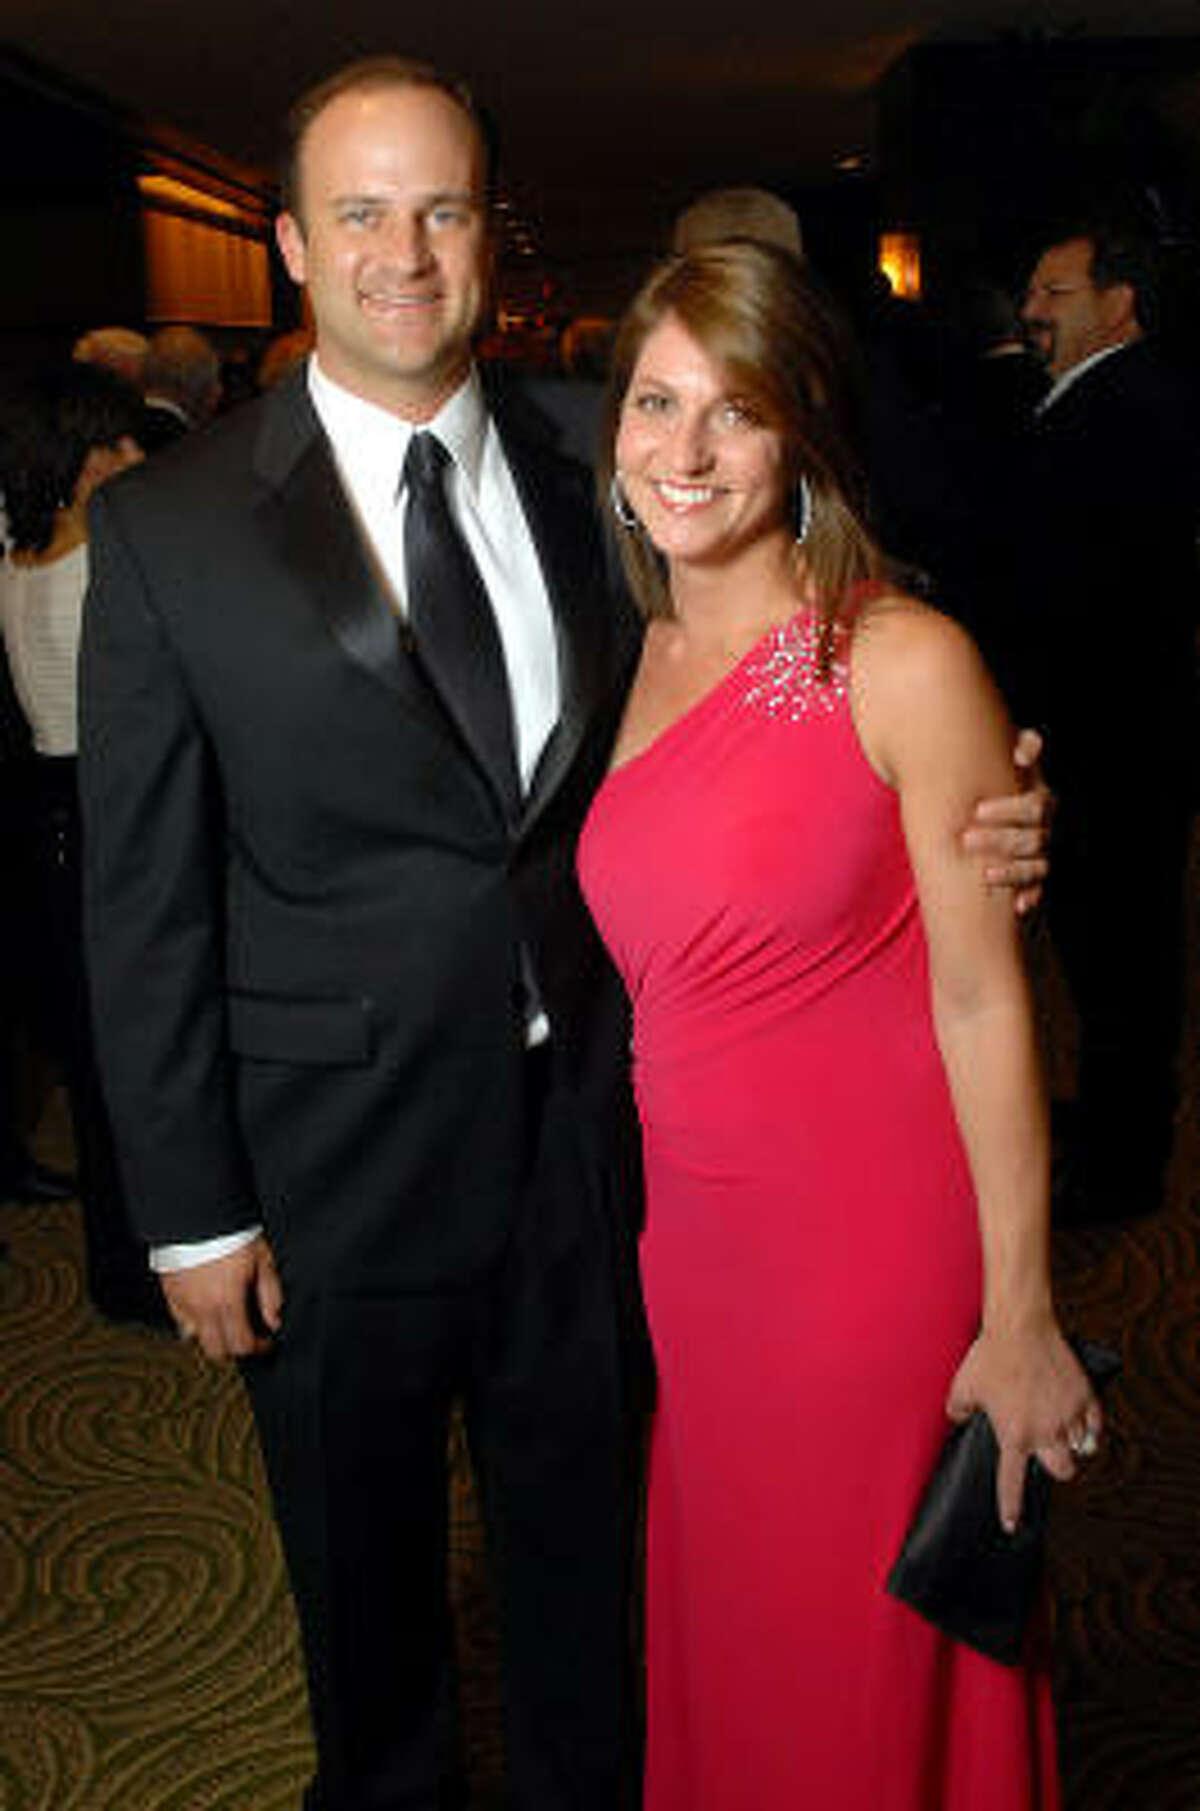 Andy Snelgrove and Leslie Zeidman